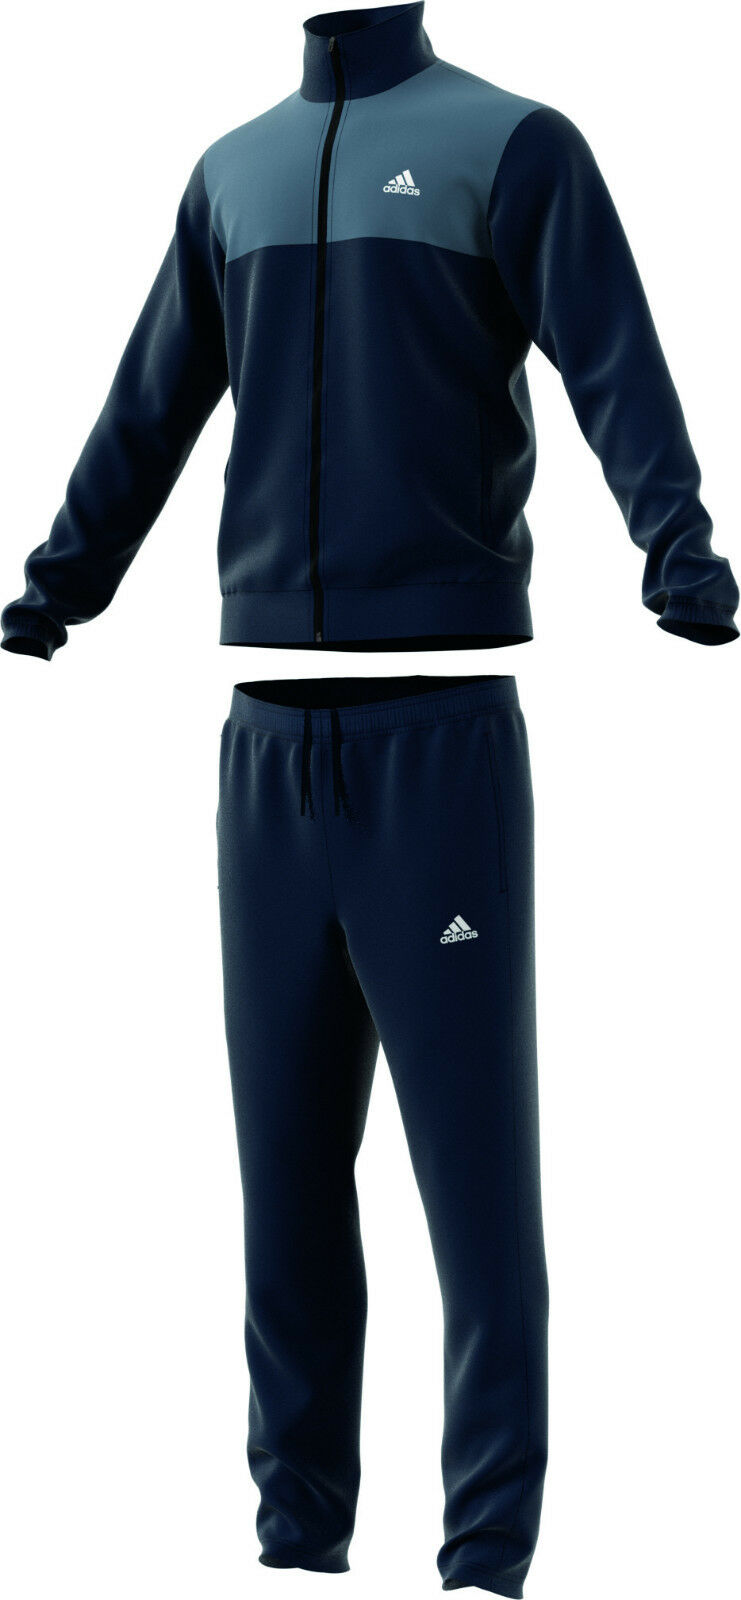 Adidas Back2Basics Tuta Sport, Casual, Tuta, Cd6603